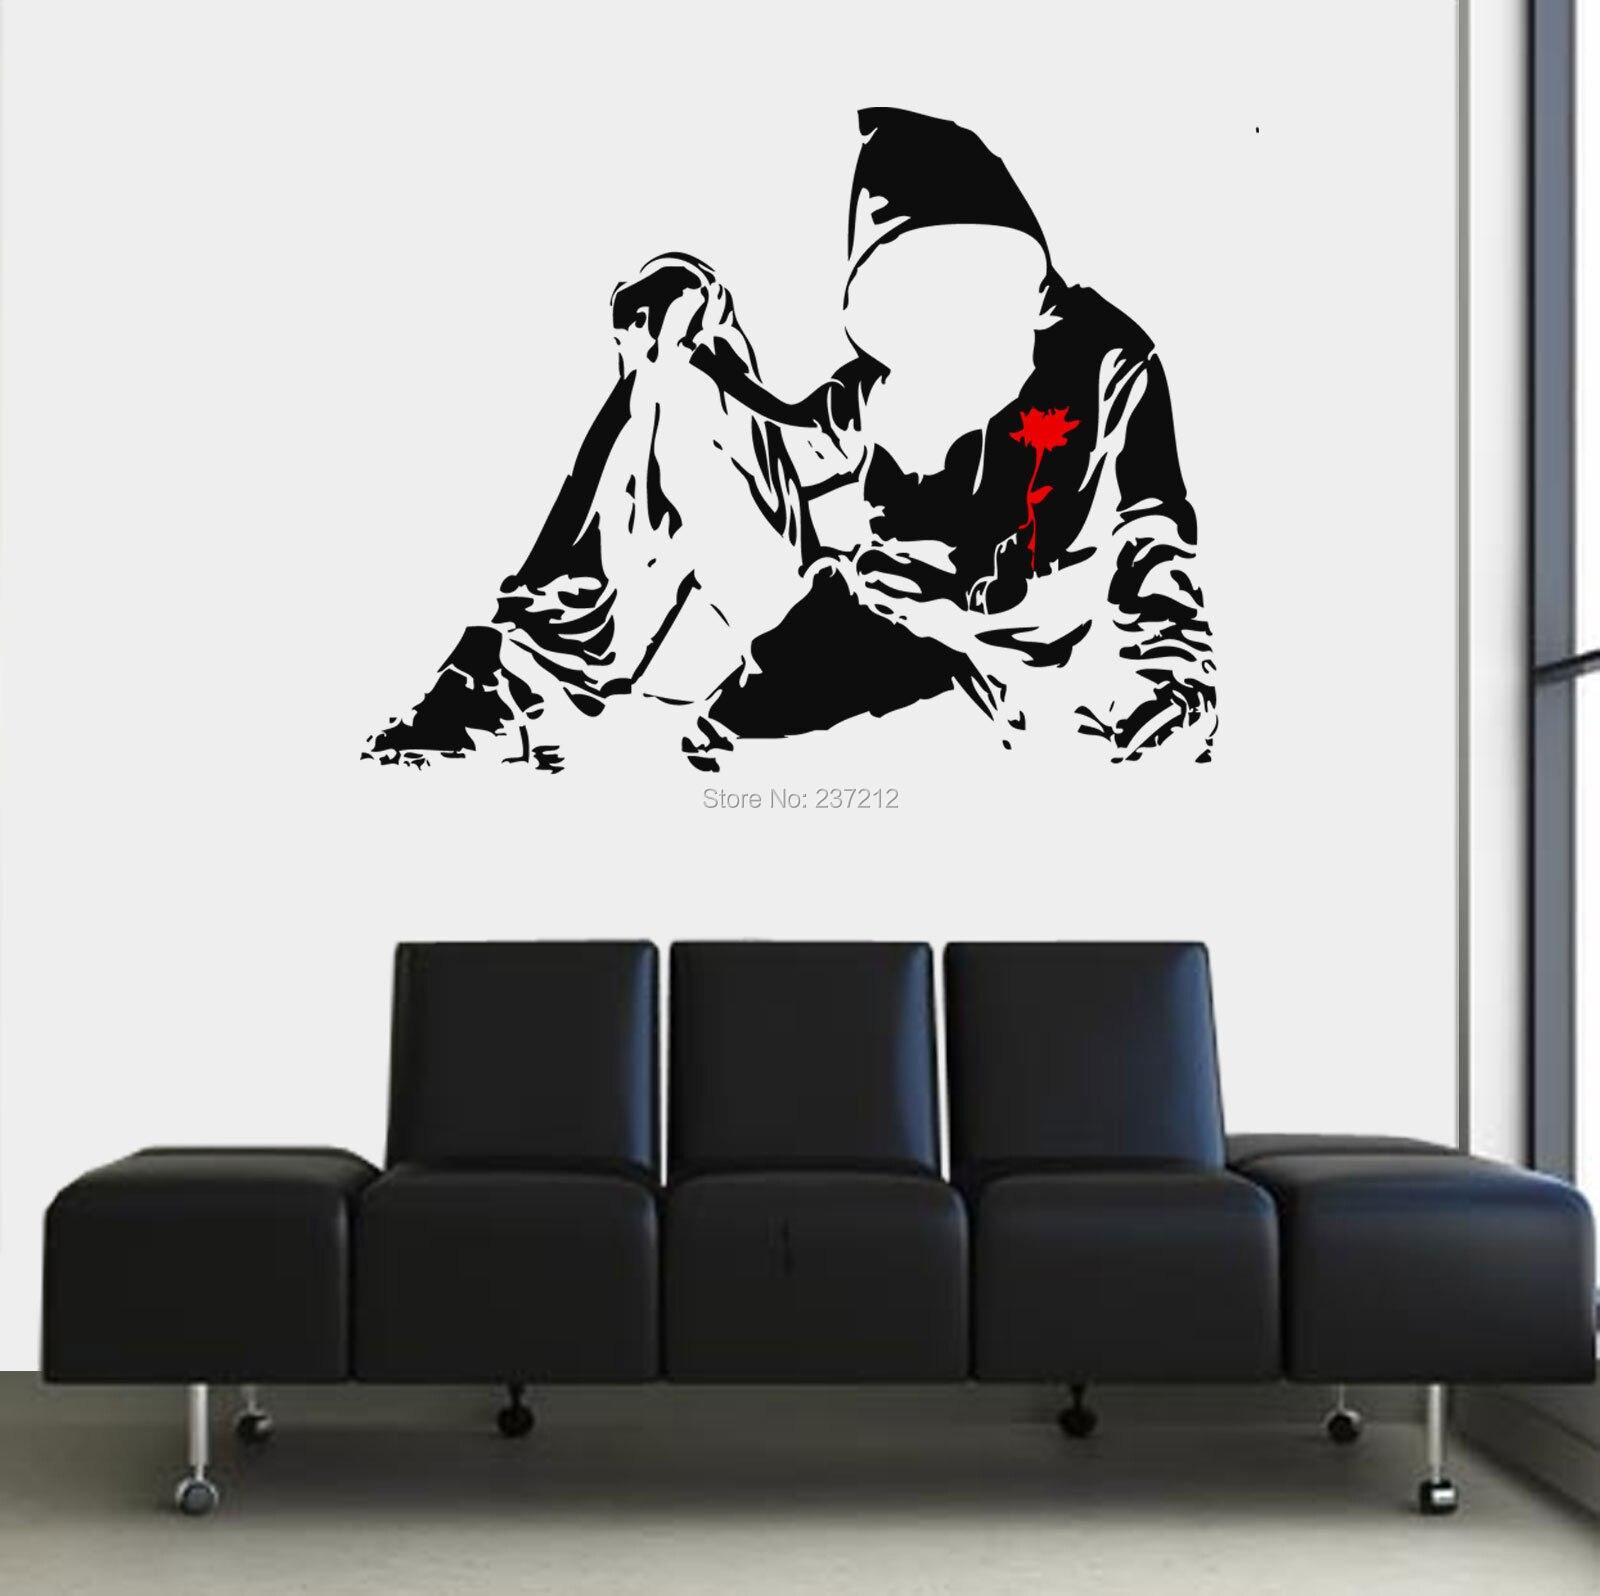 Sticker wall graffiti - Free Shipping Banksy Graffiti Hoodie Wall Transfer Vinyl Art Decal Graphical Room Sticker China